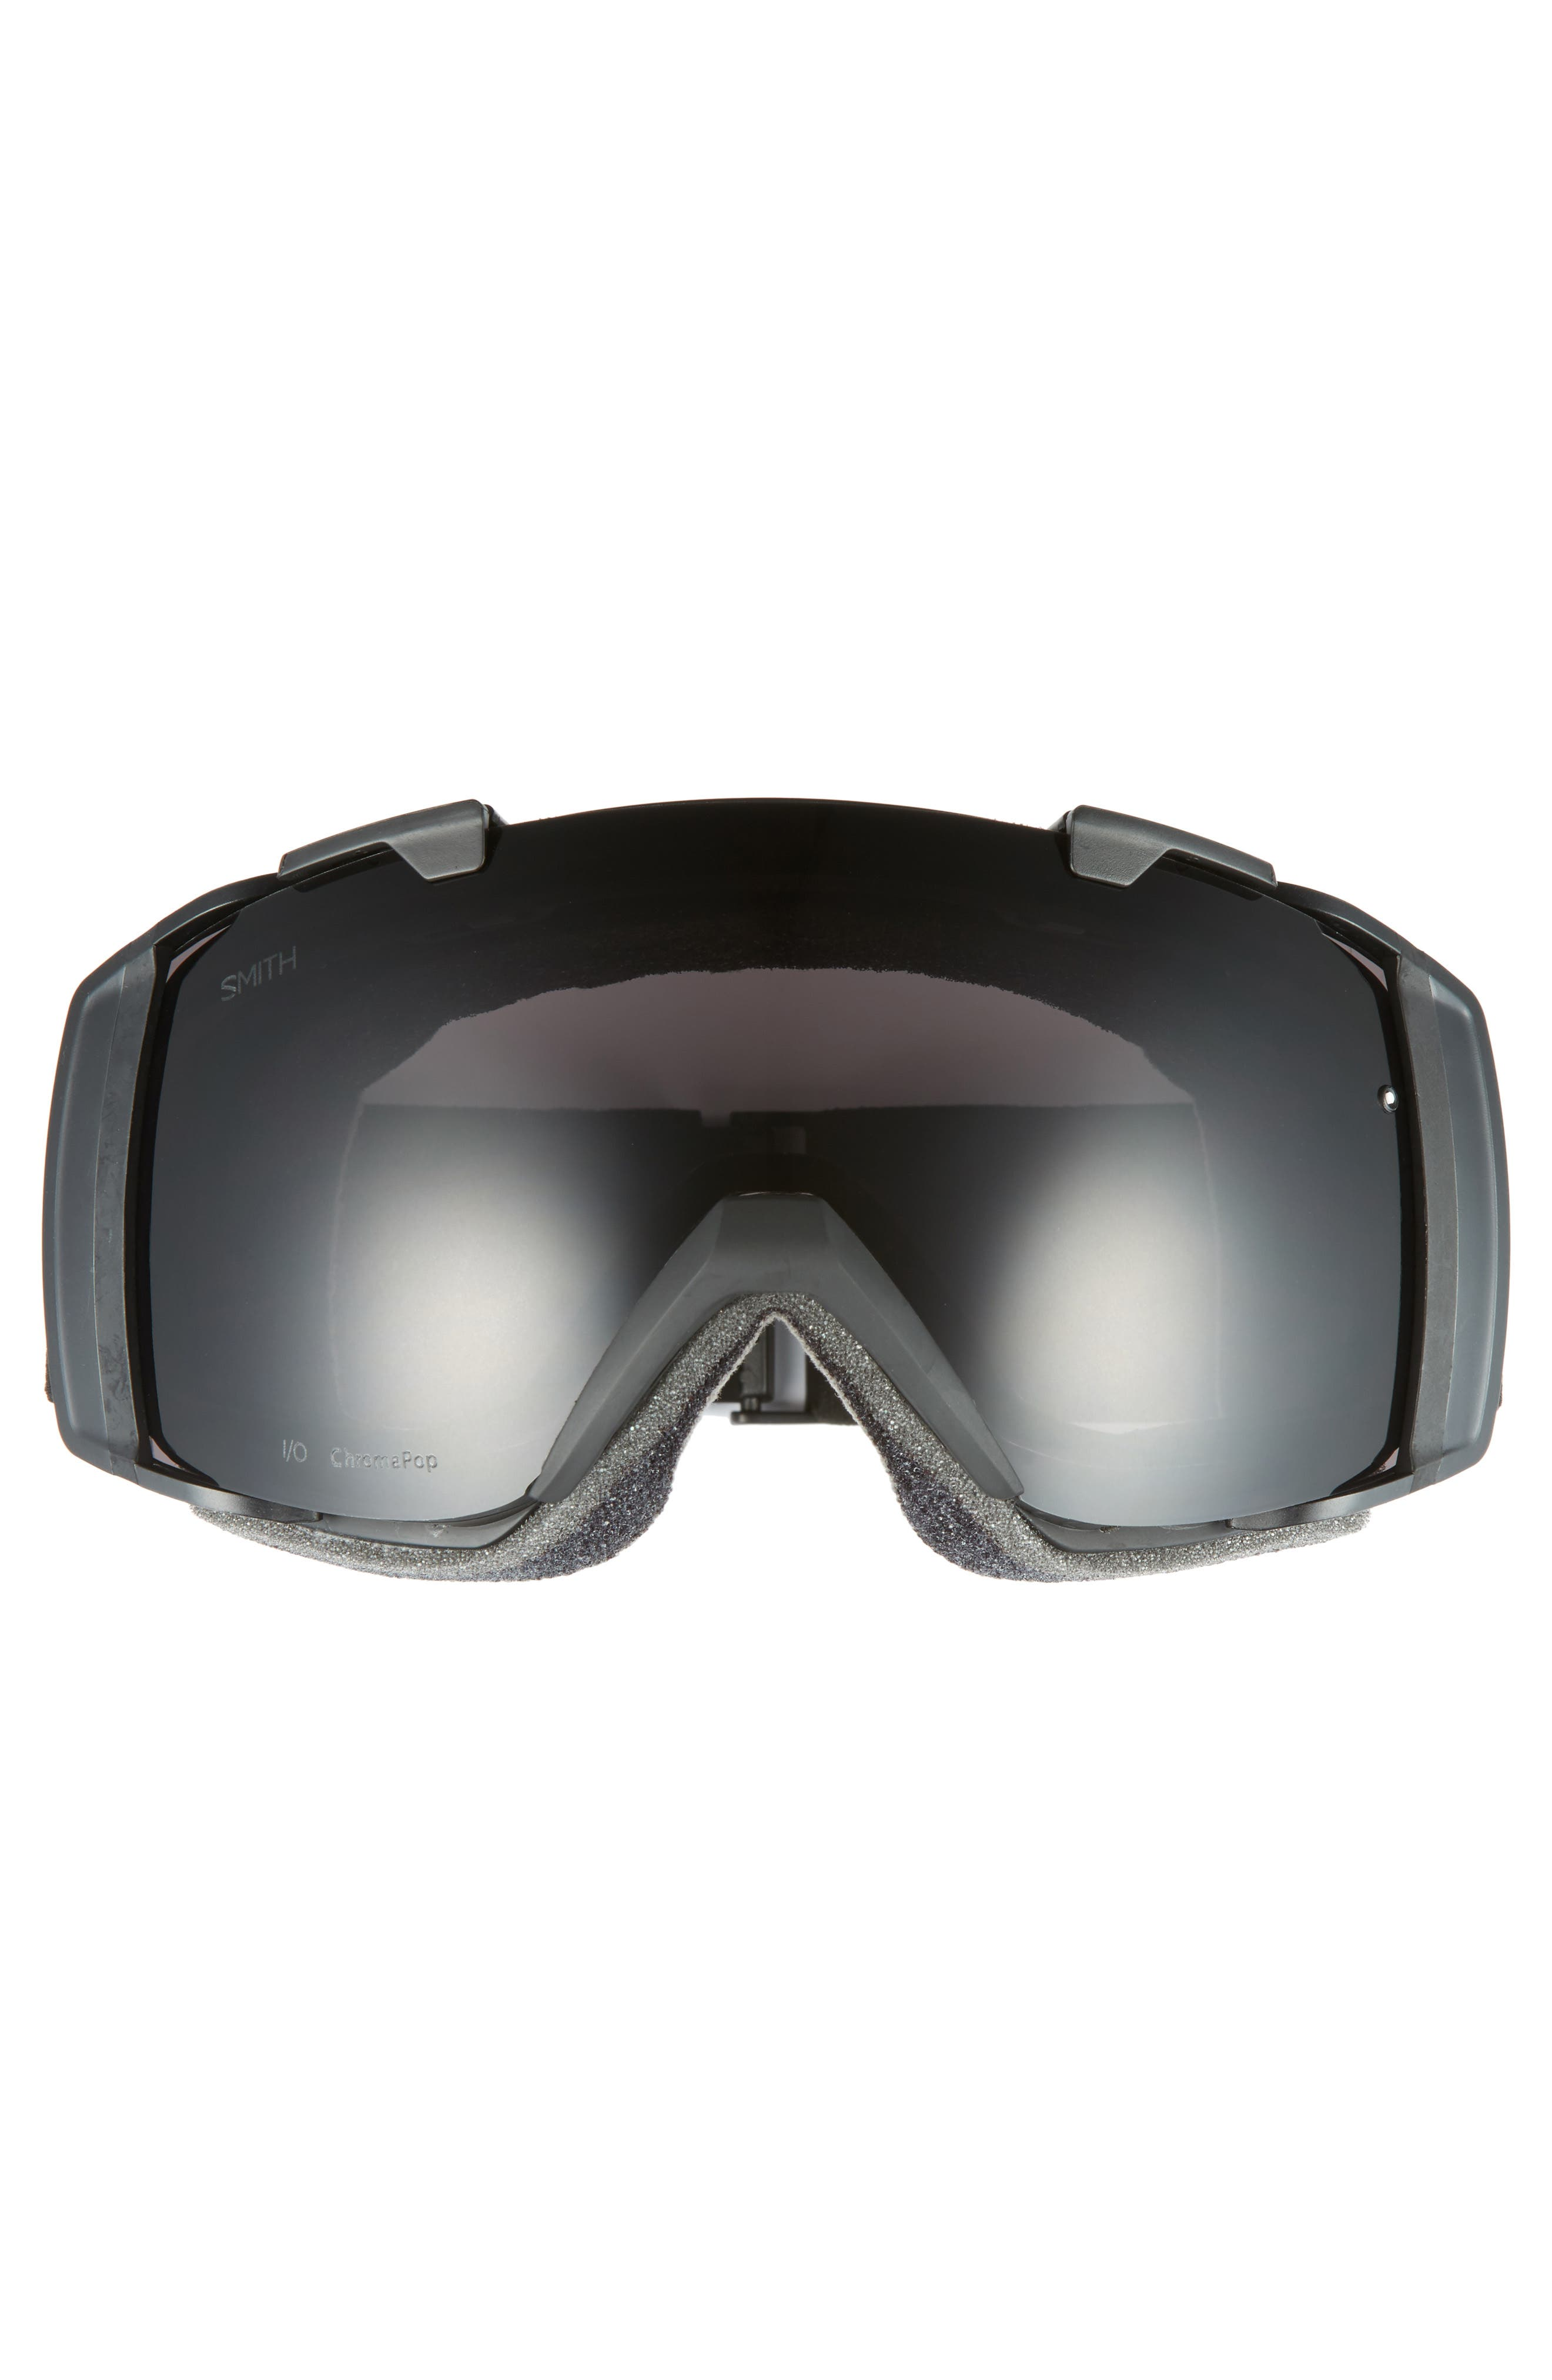 Alternate Image 3  - Smith I/O 180mm Snow/Ski Goggles